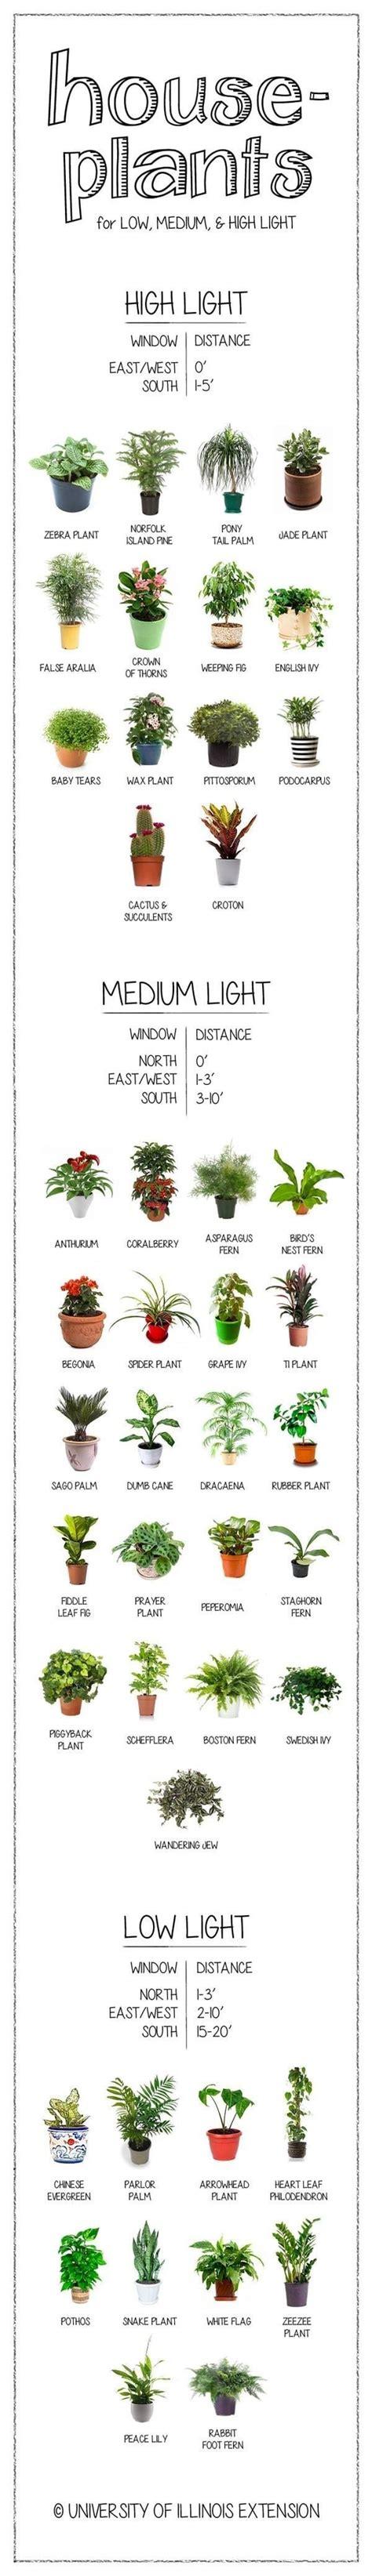 best plants for no sunlight 25 best ideas about avocado tree on pinterest grow